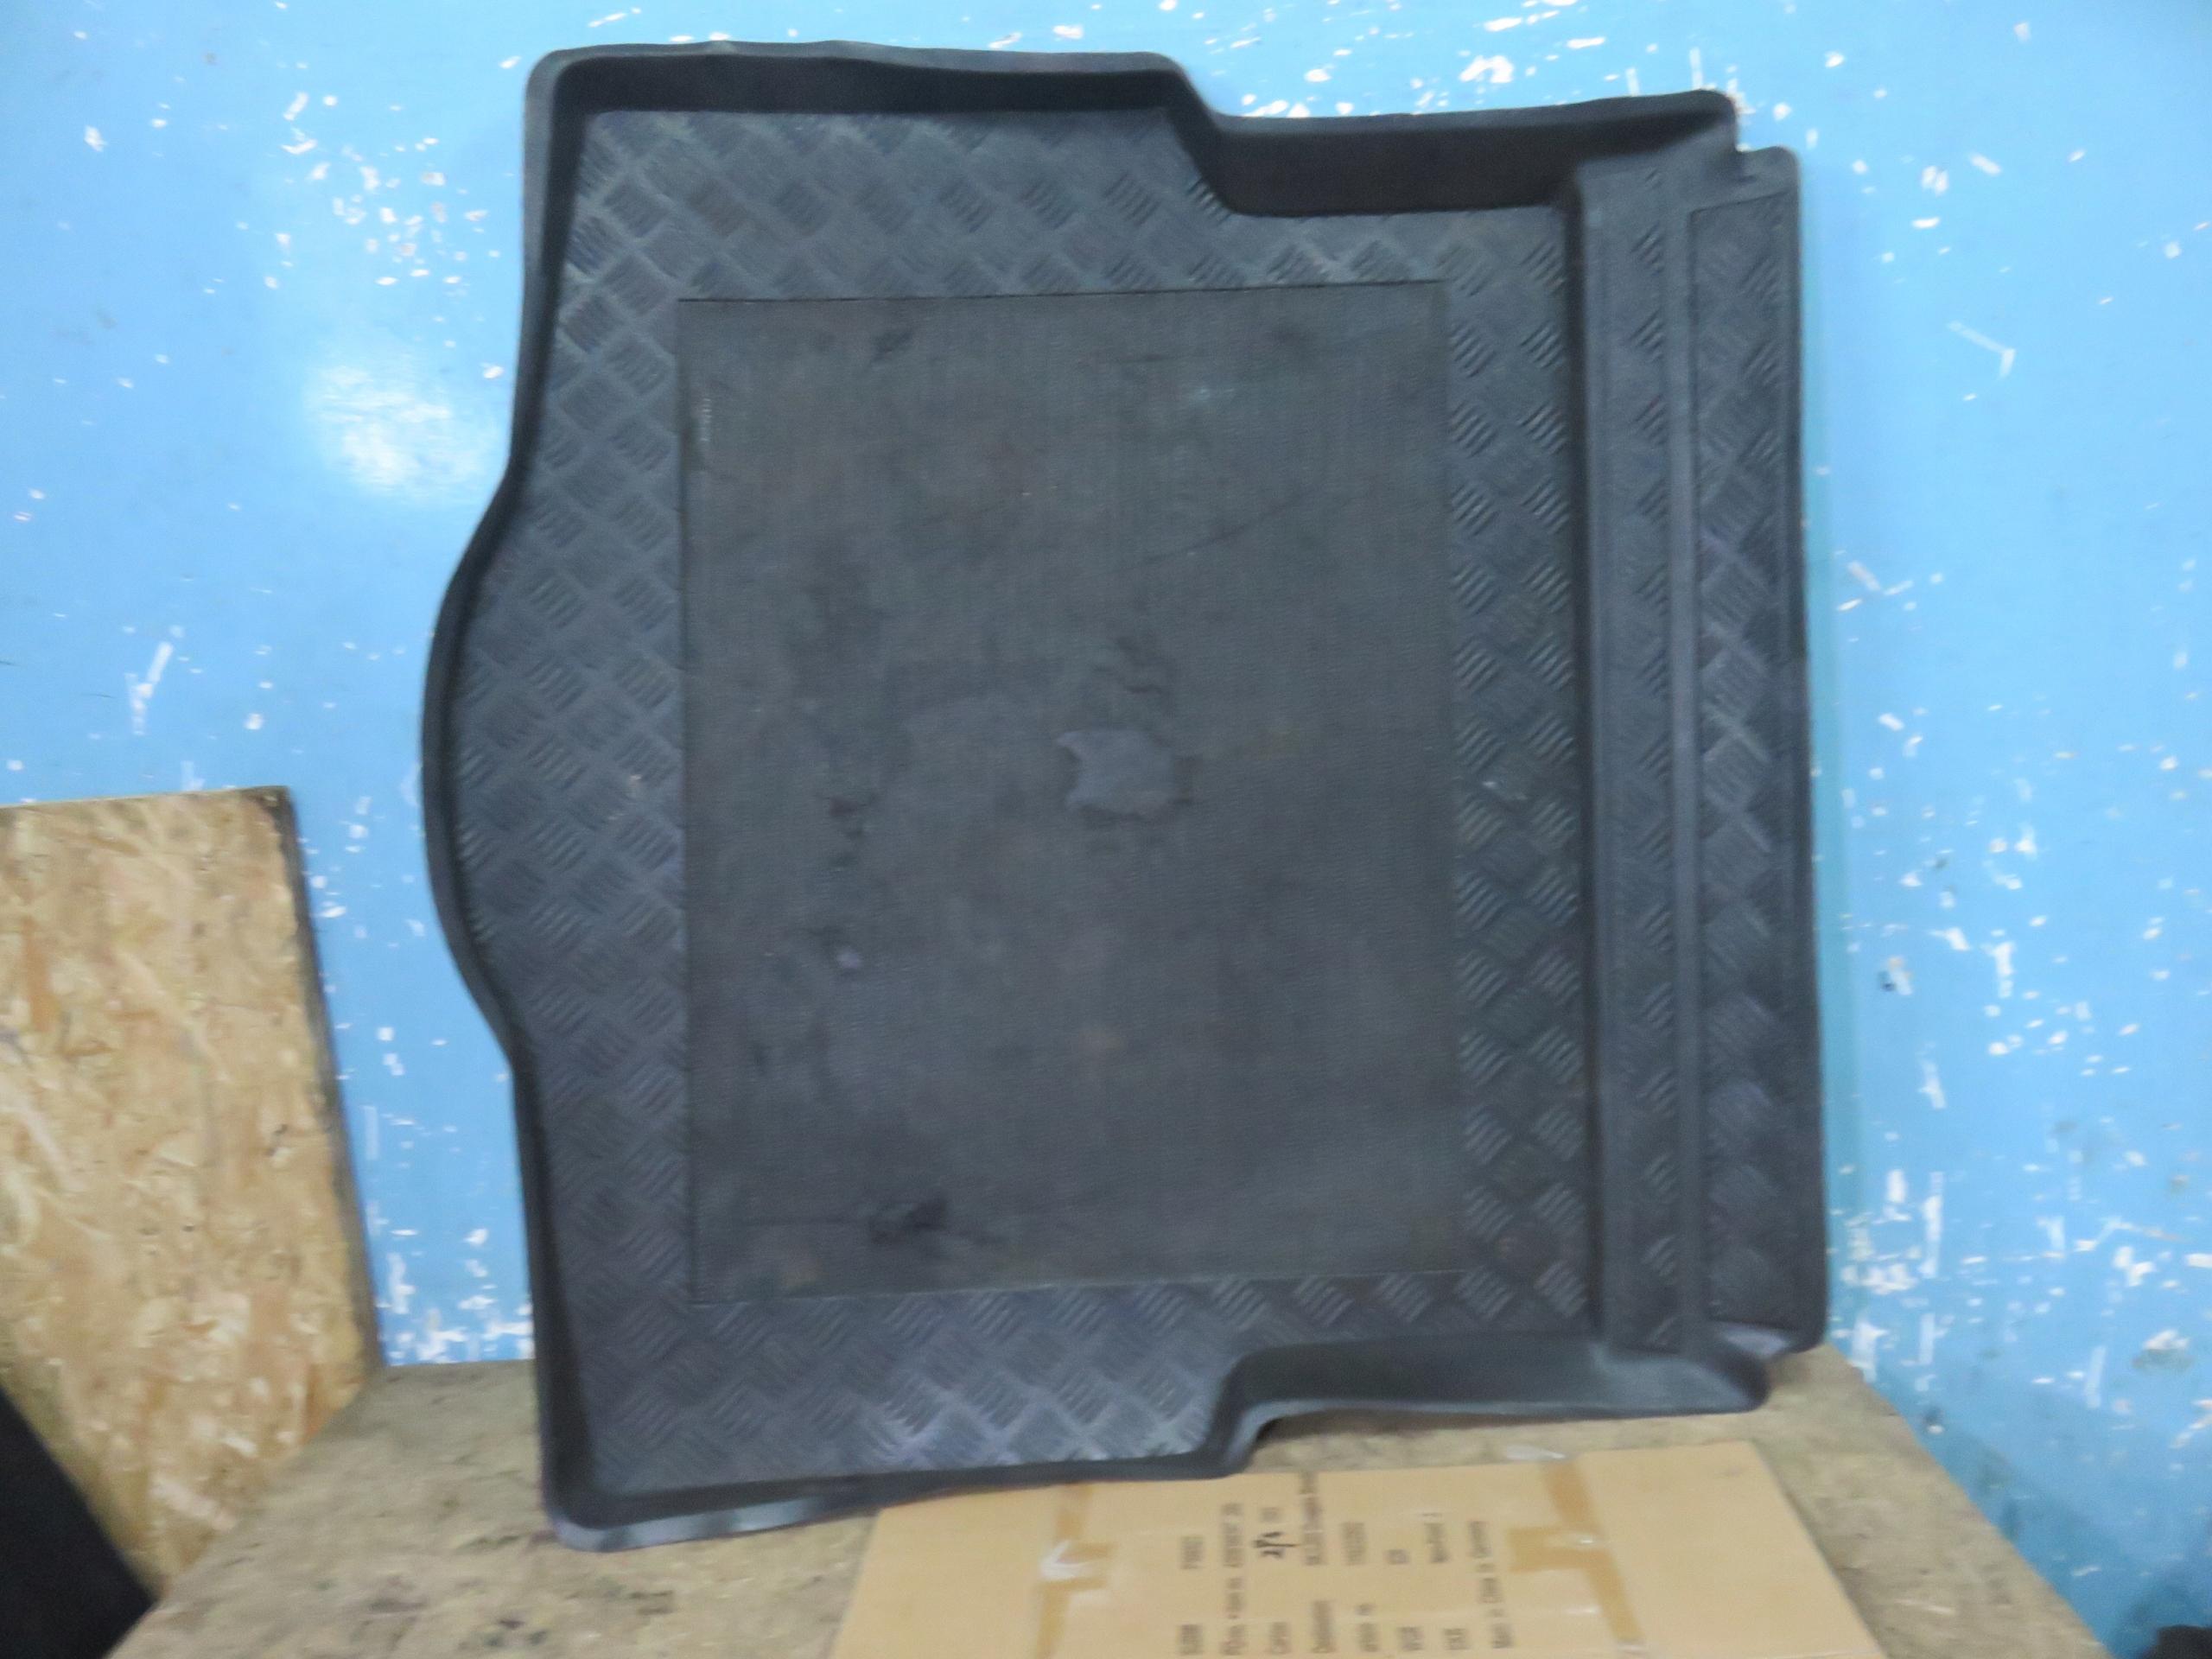 альфа romeo 159 ковровое багажник sw универсал